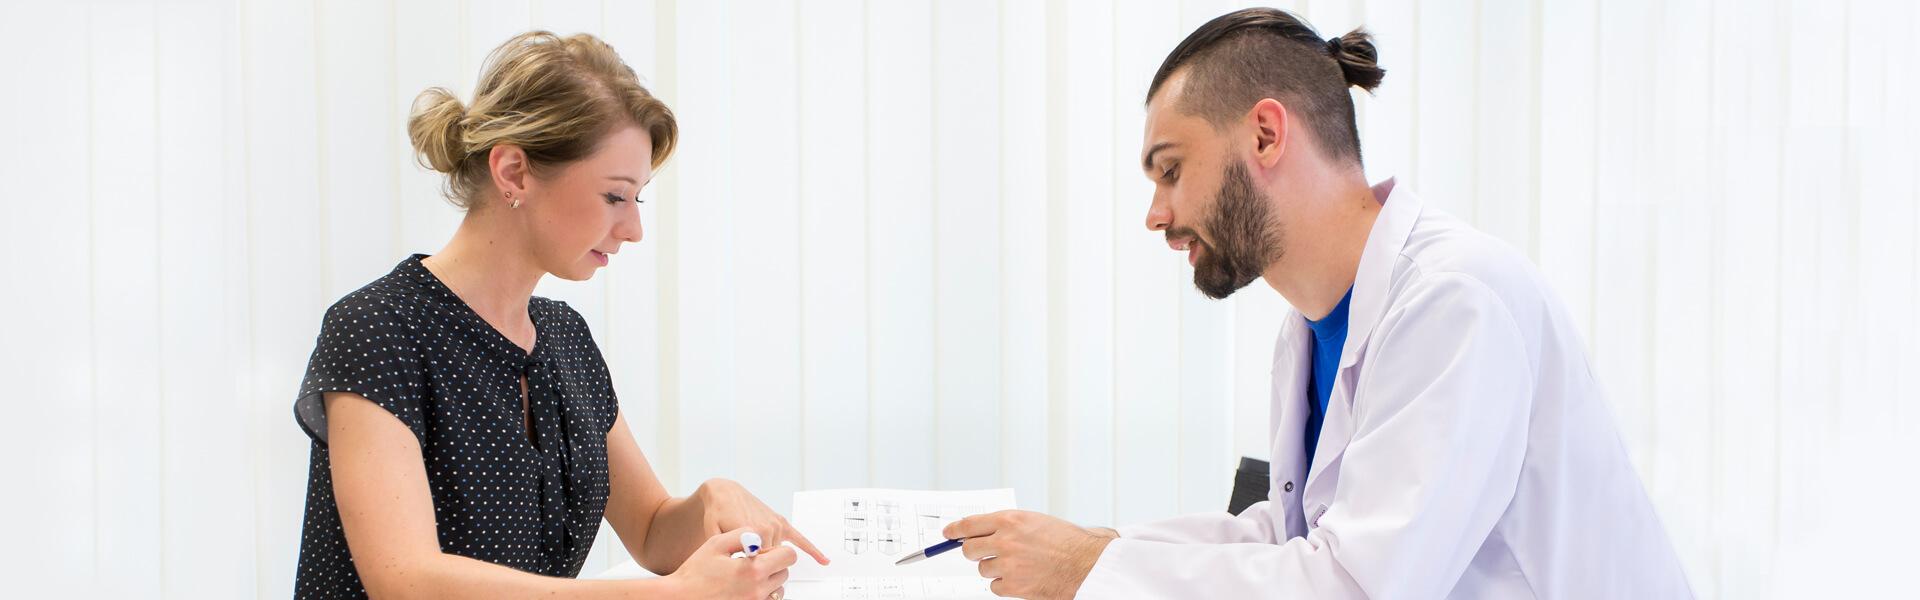 medycynapracy-betamed